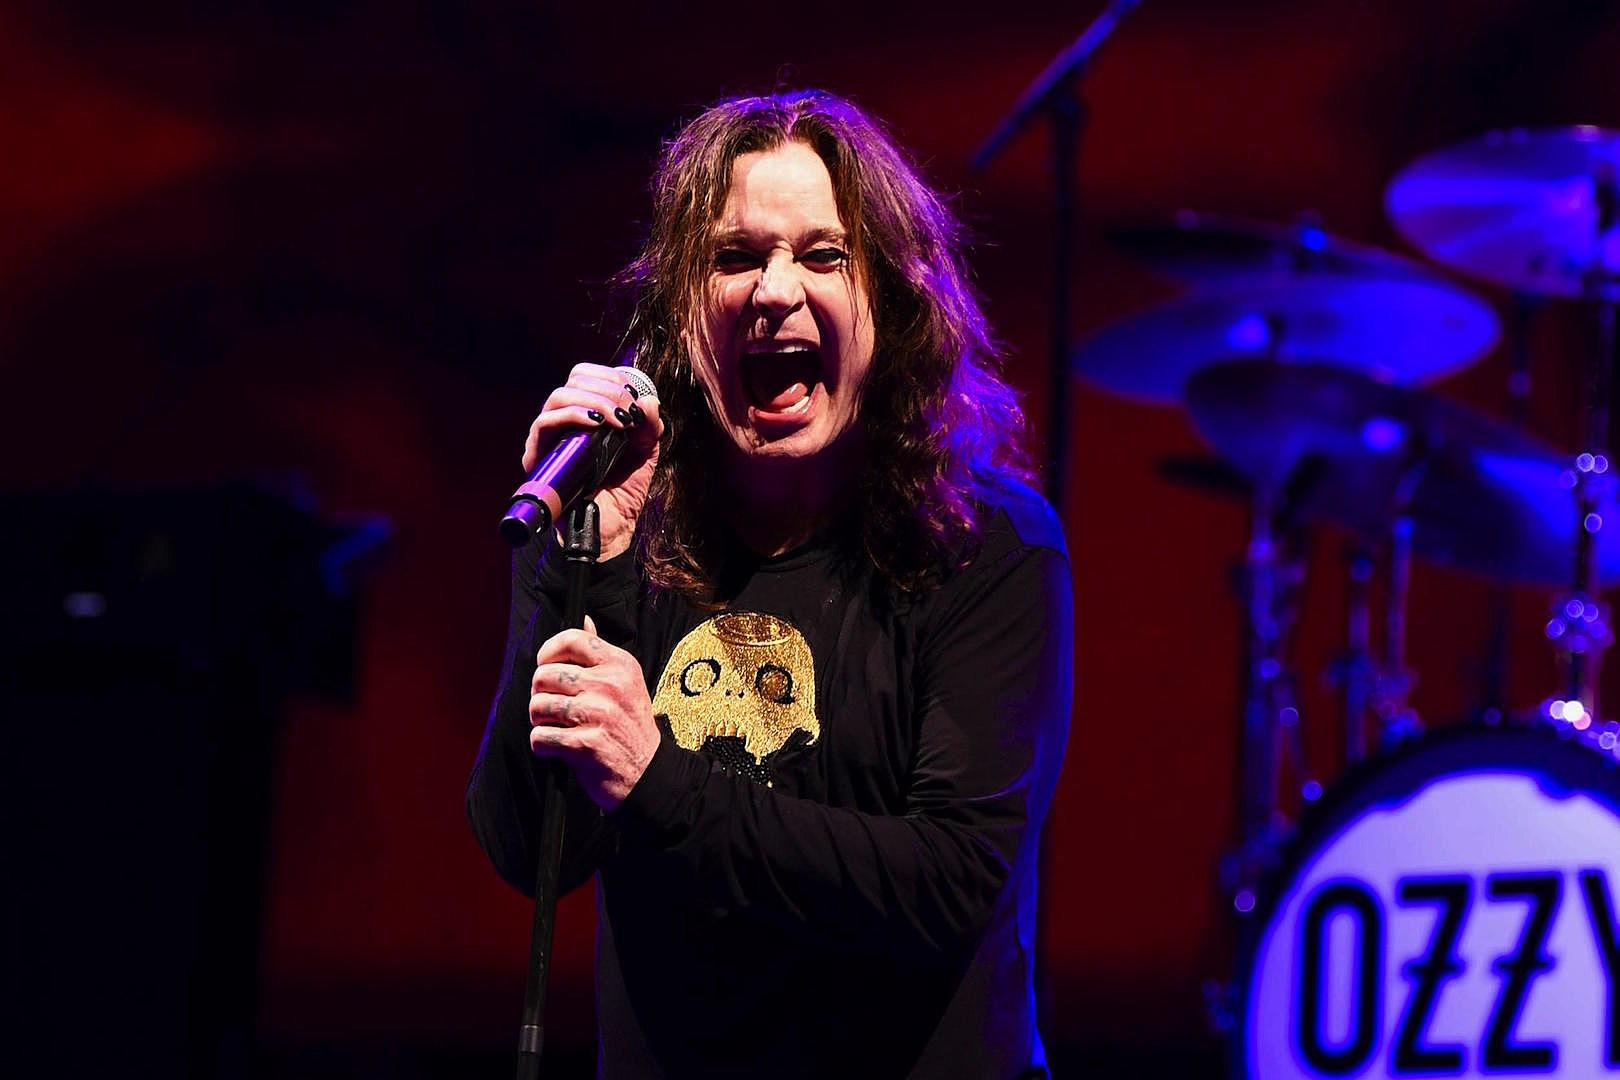 Watch Ozzy Osbourne's Grandkids Head Bang + Sing to 'Crazy Train'